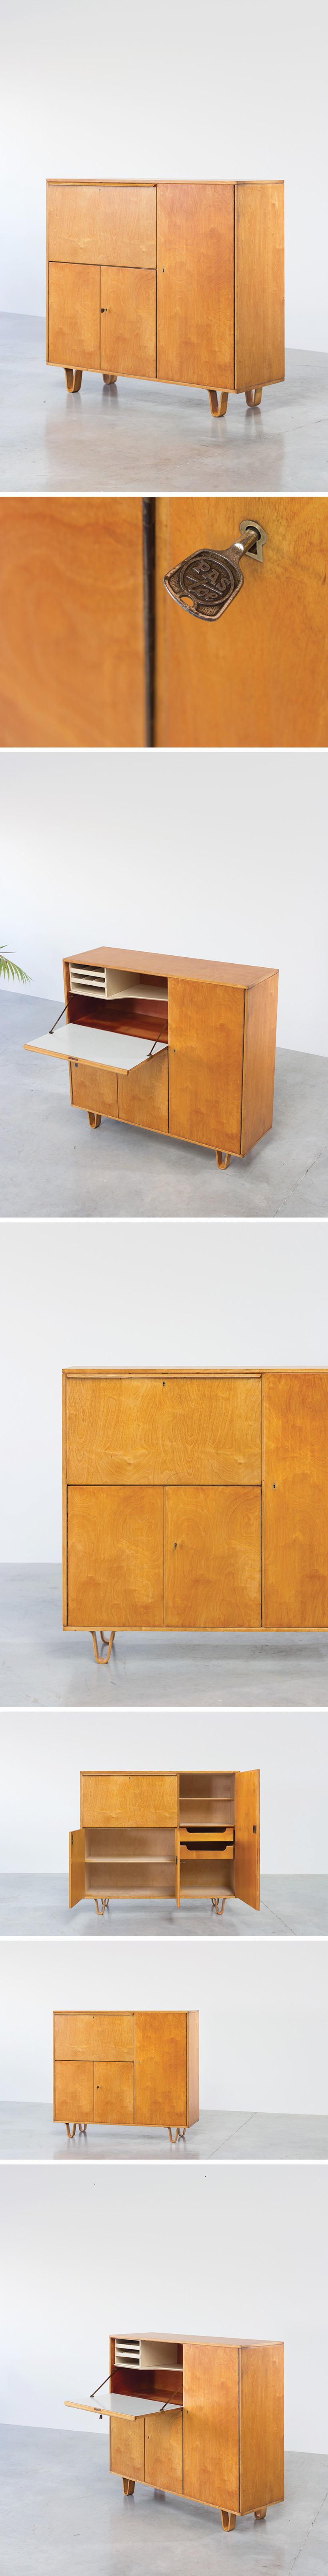 Cees Braakman cabinet CB01 Combex circa 1950 Large